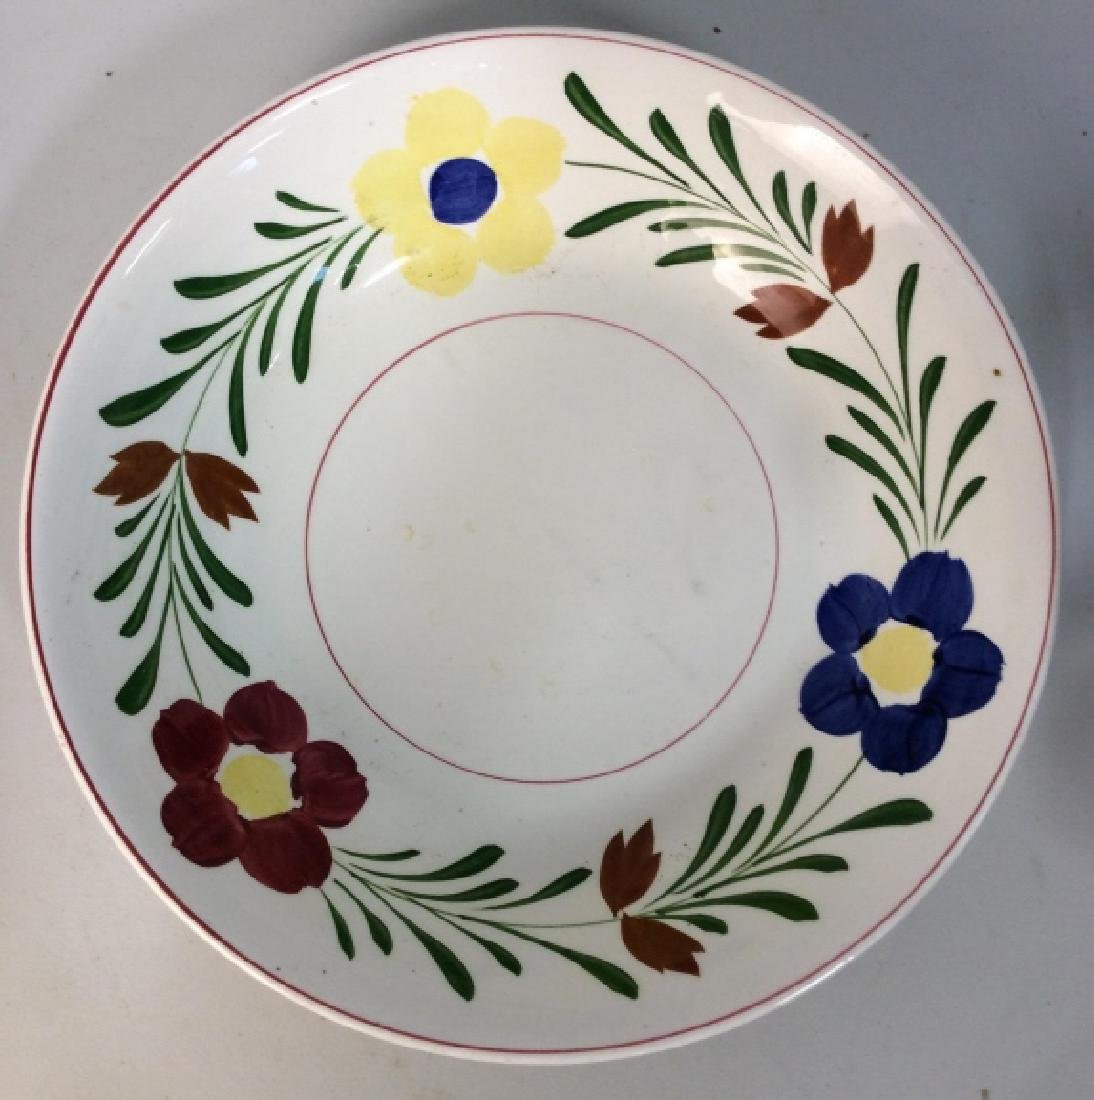 Ceramic Porcelain Hand Painted Serving Bowl